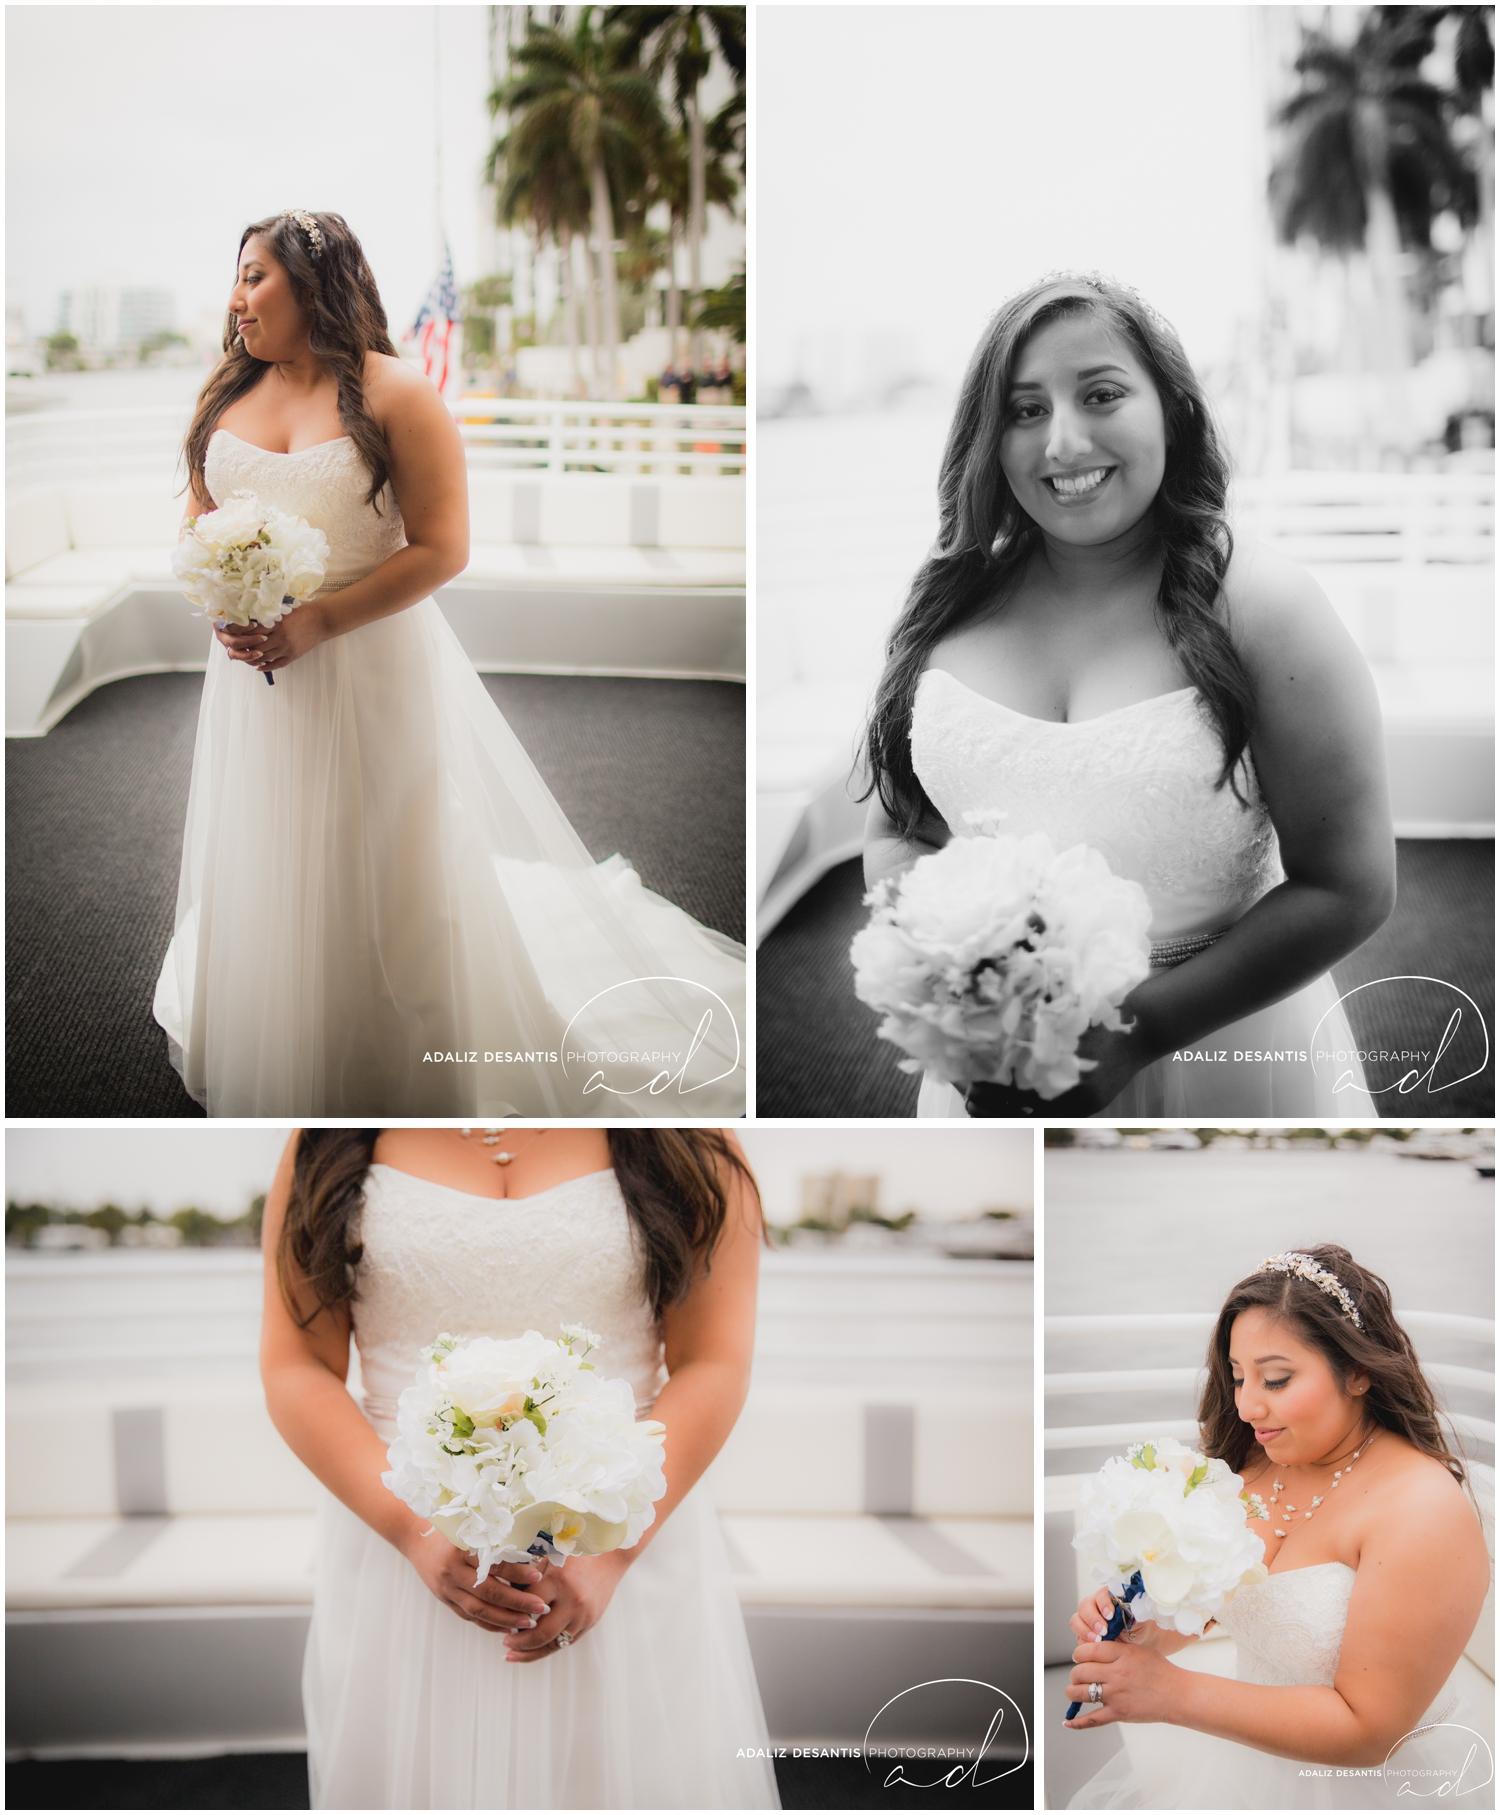 Taylor and amanda Indiana Fort Lauderdale Sun Dream yacht charter wedding 6